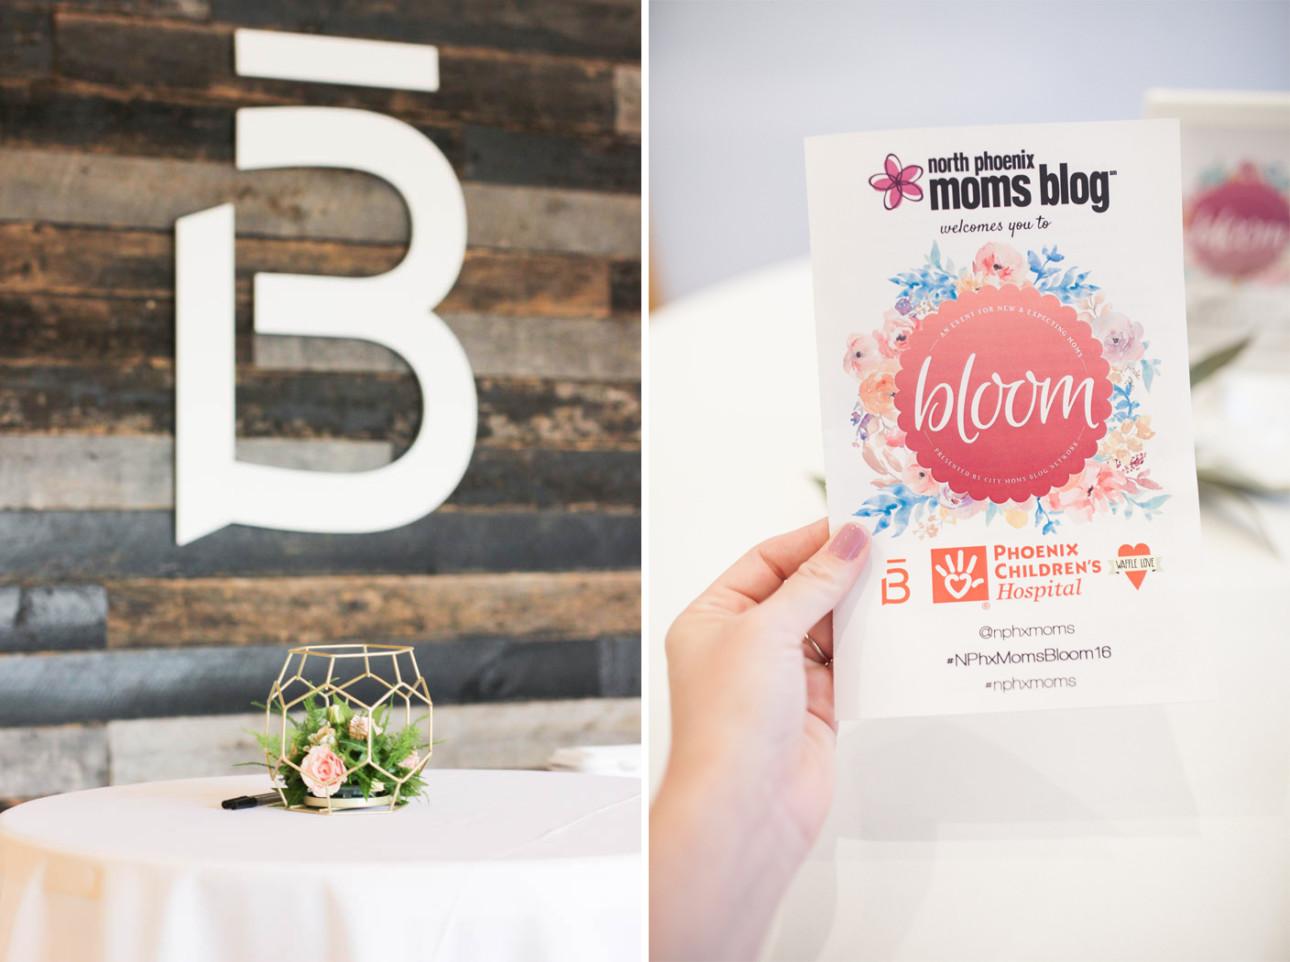 003 North Phoenix Moms Blog - Bloom (1)